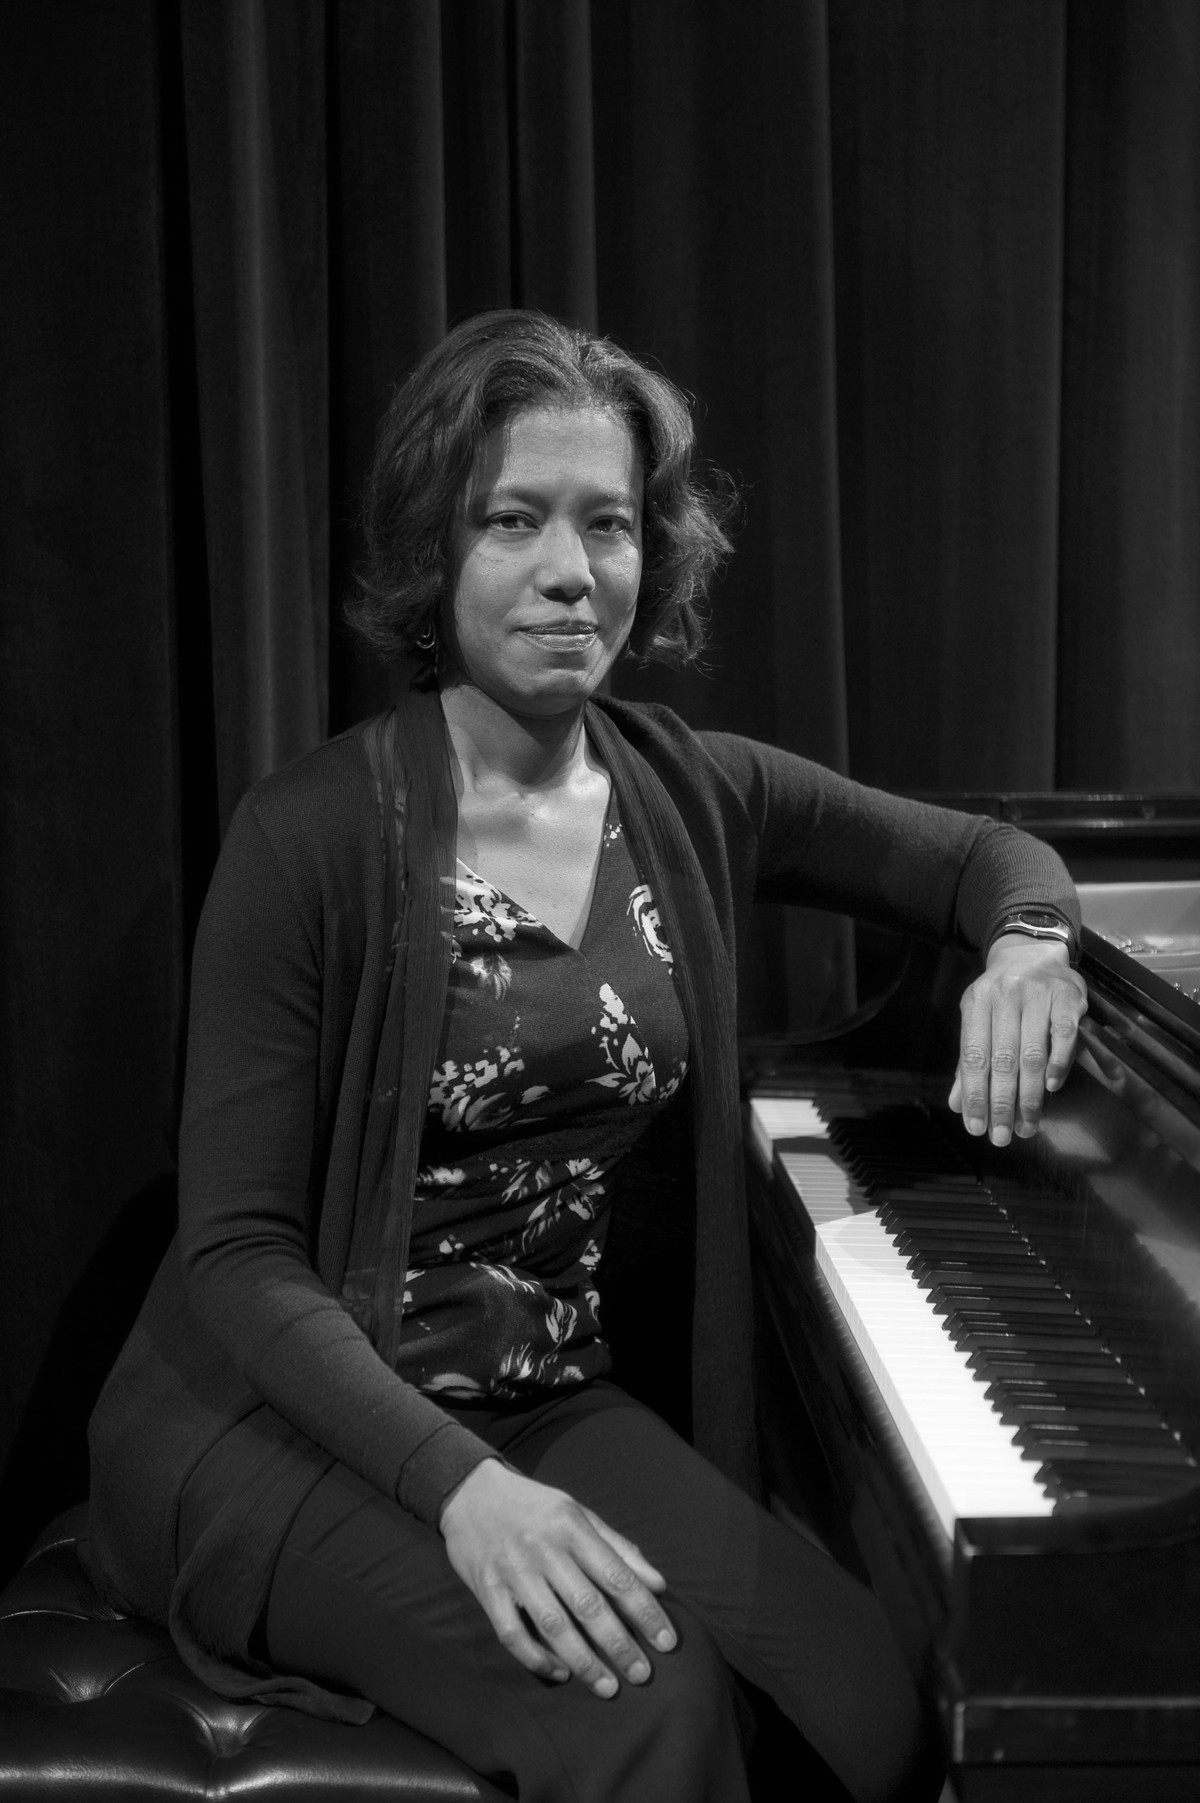 Christine Delbeau